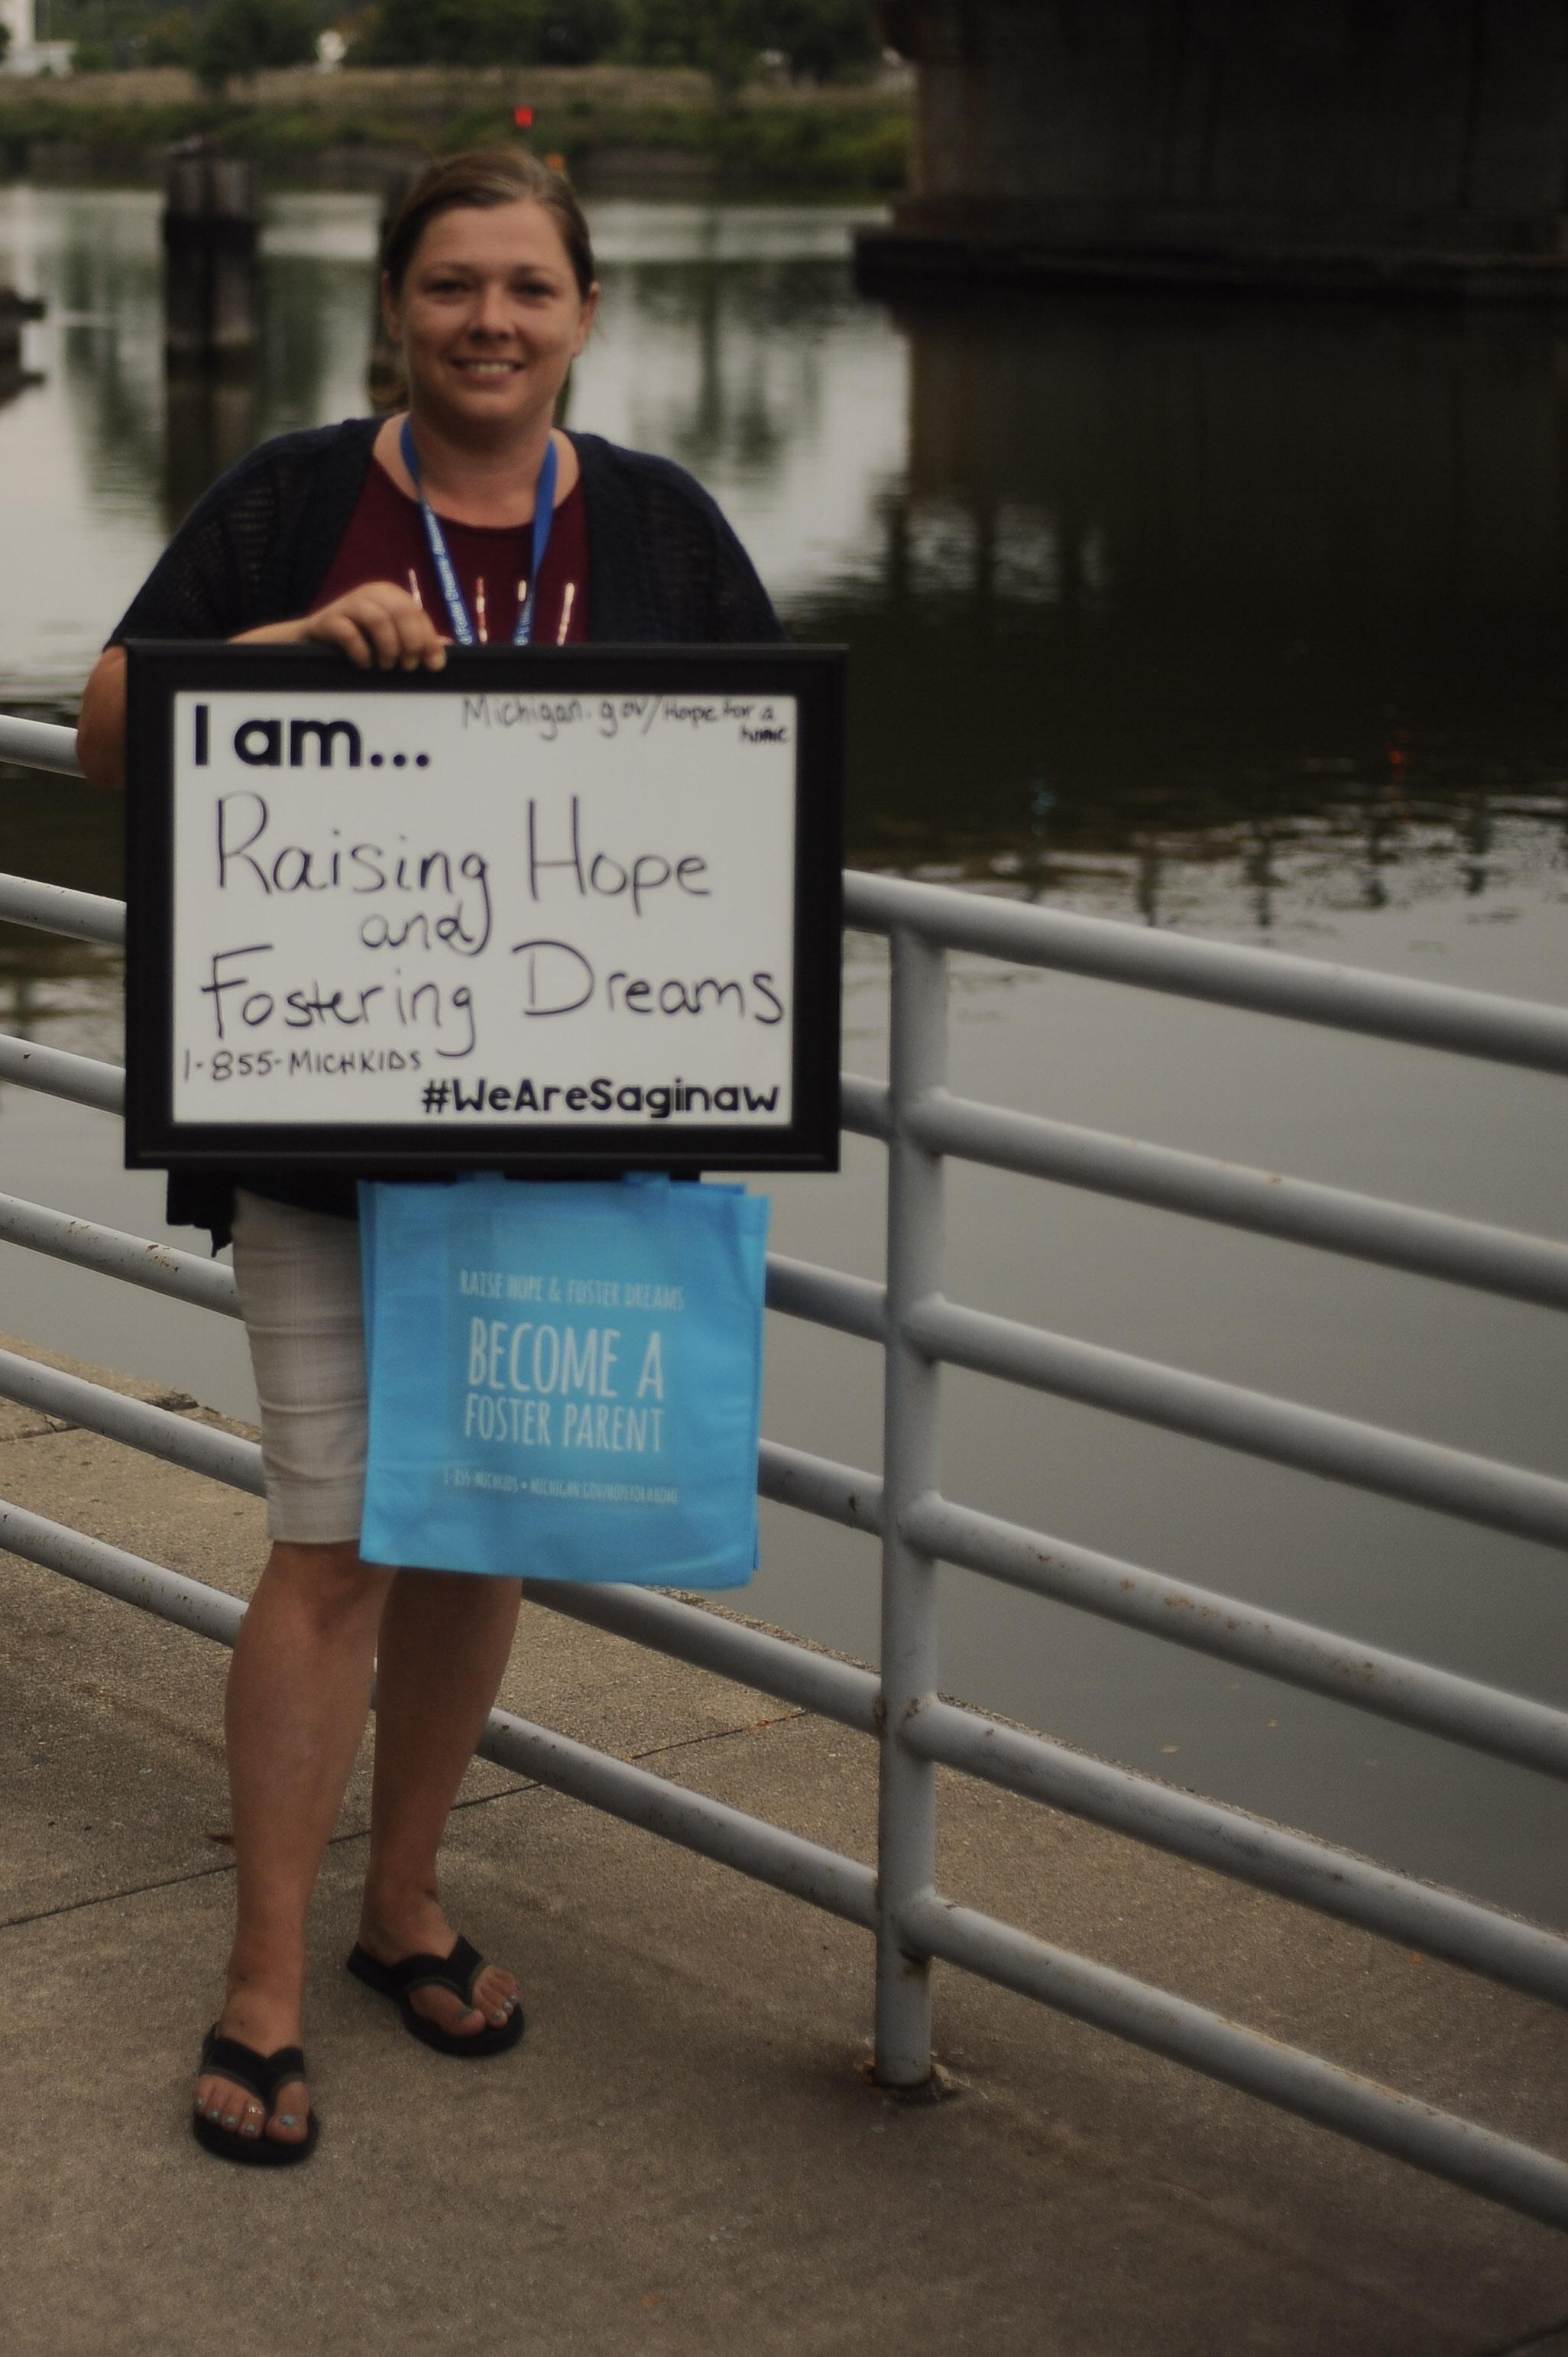 I AM… Raising Hope & Fostering Dreams